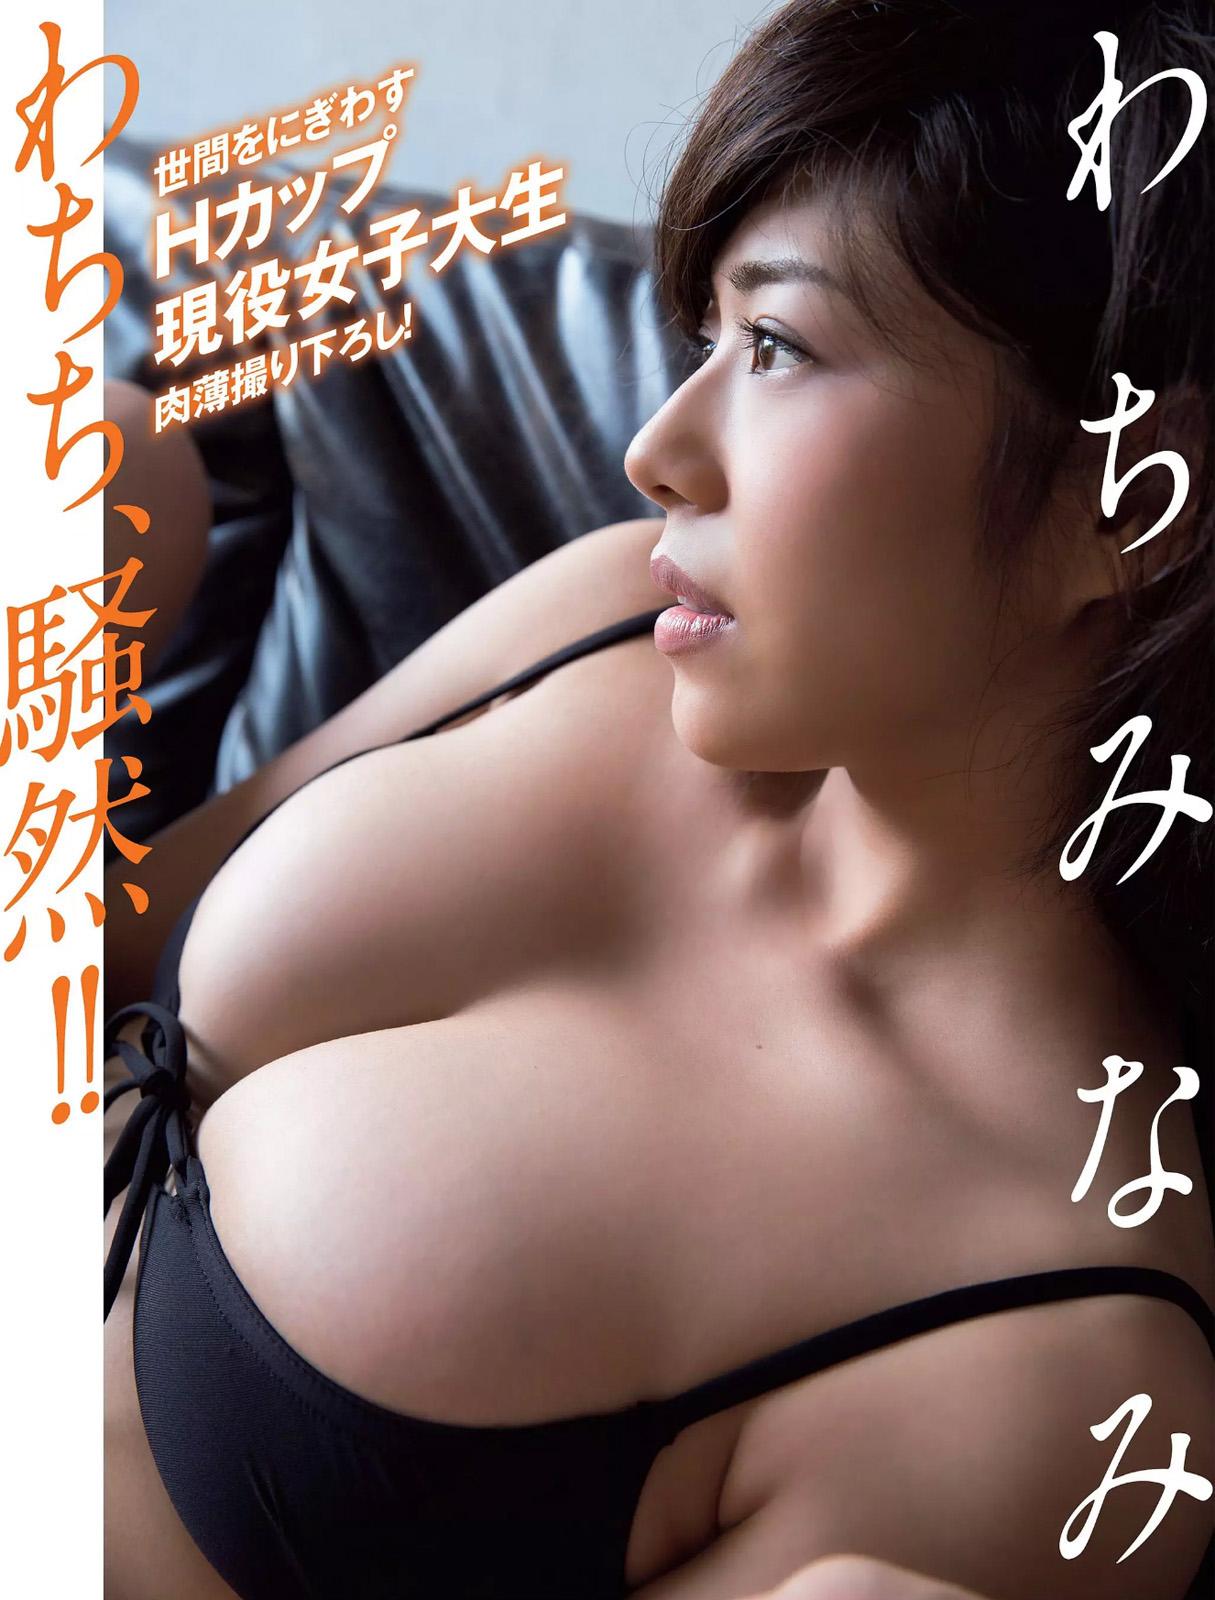 Minami Wachi わちみなみ, FLASH 電子版 2017.09.05 (フラッシュ 2017年09月05日号)